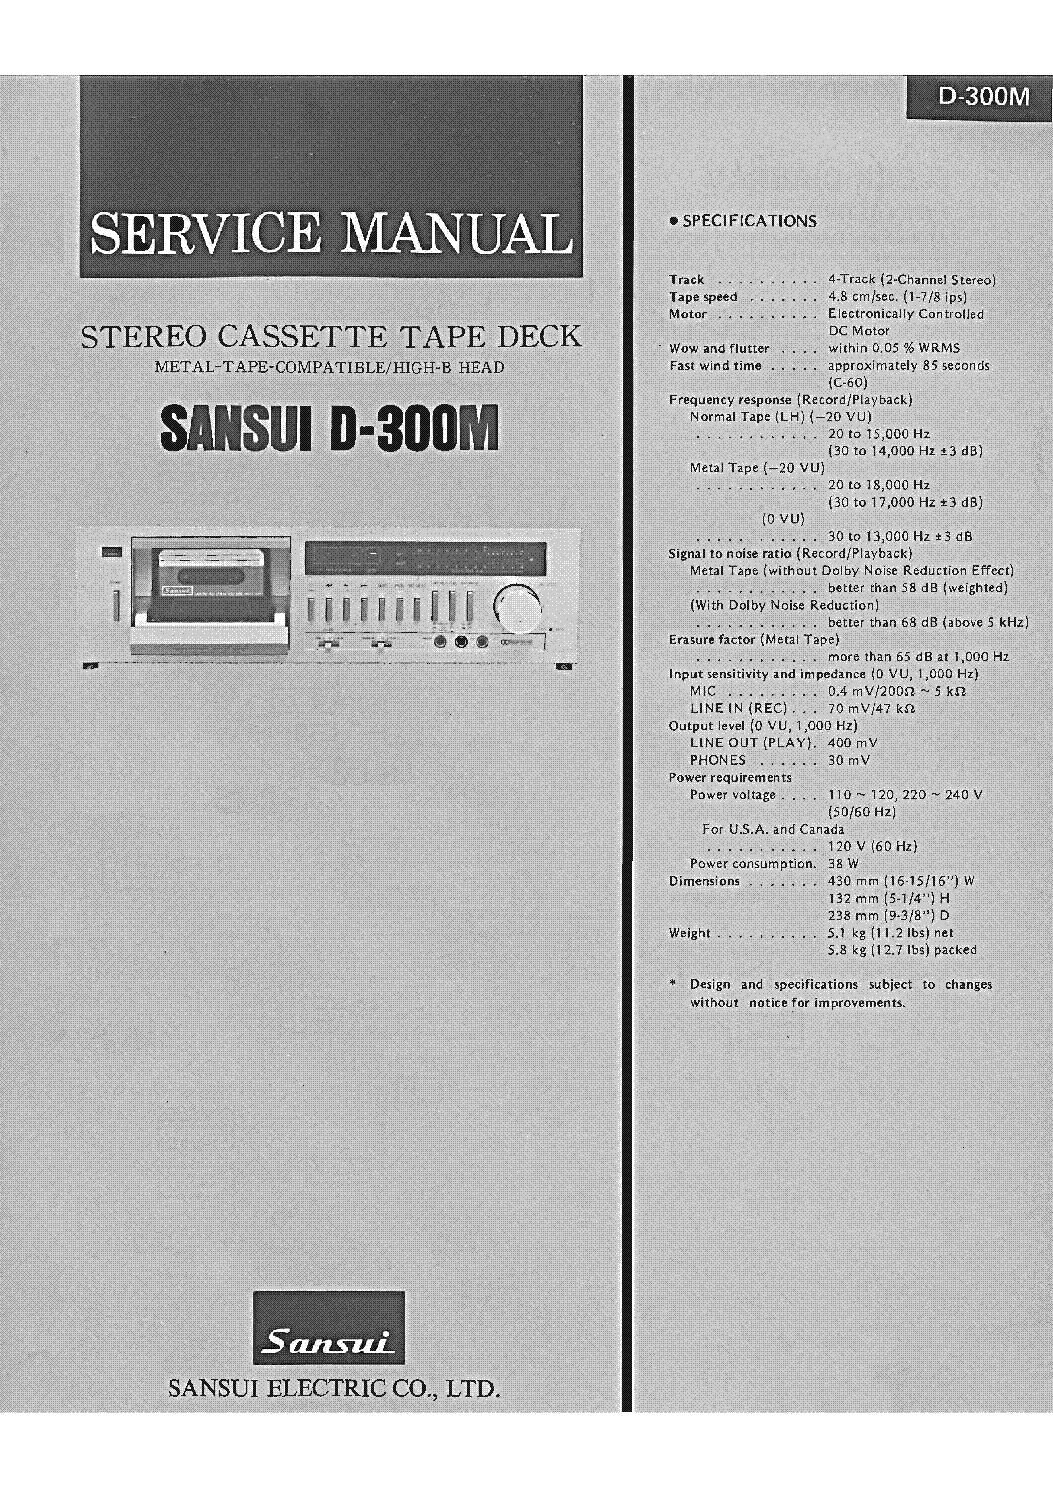 sansui d 300m service manual download schematics eeprom repair rh  elektrotanya com sansui d-